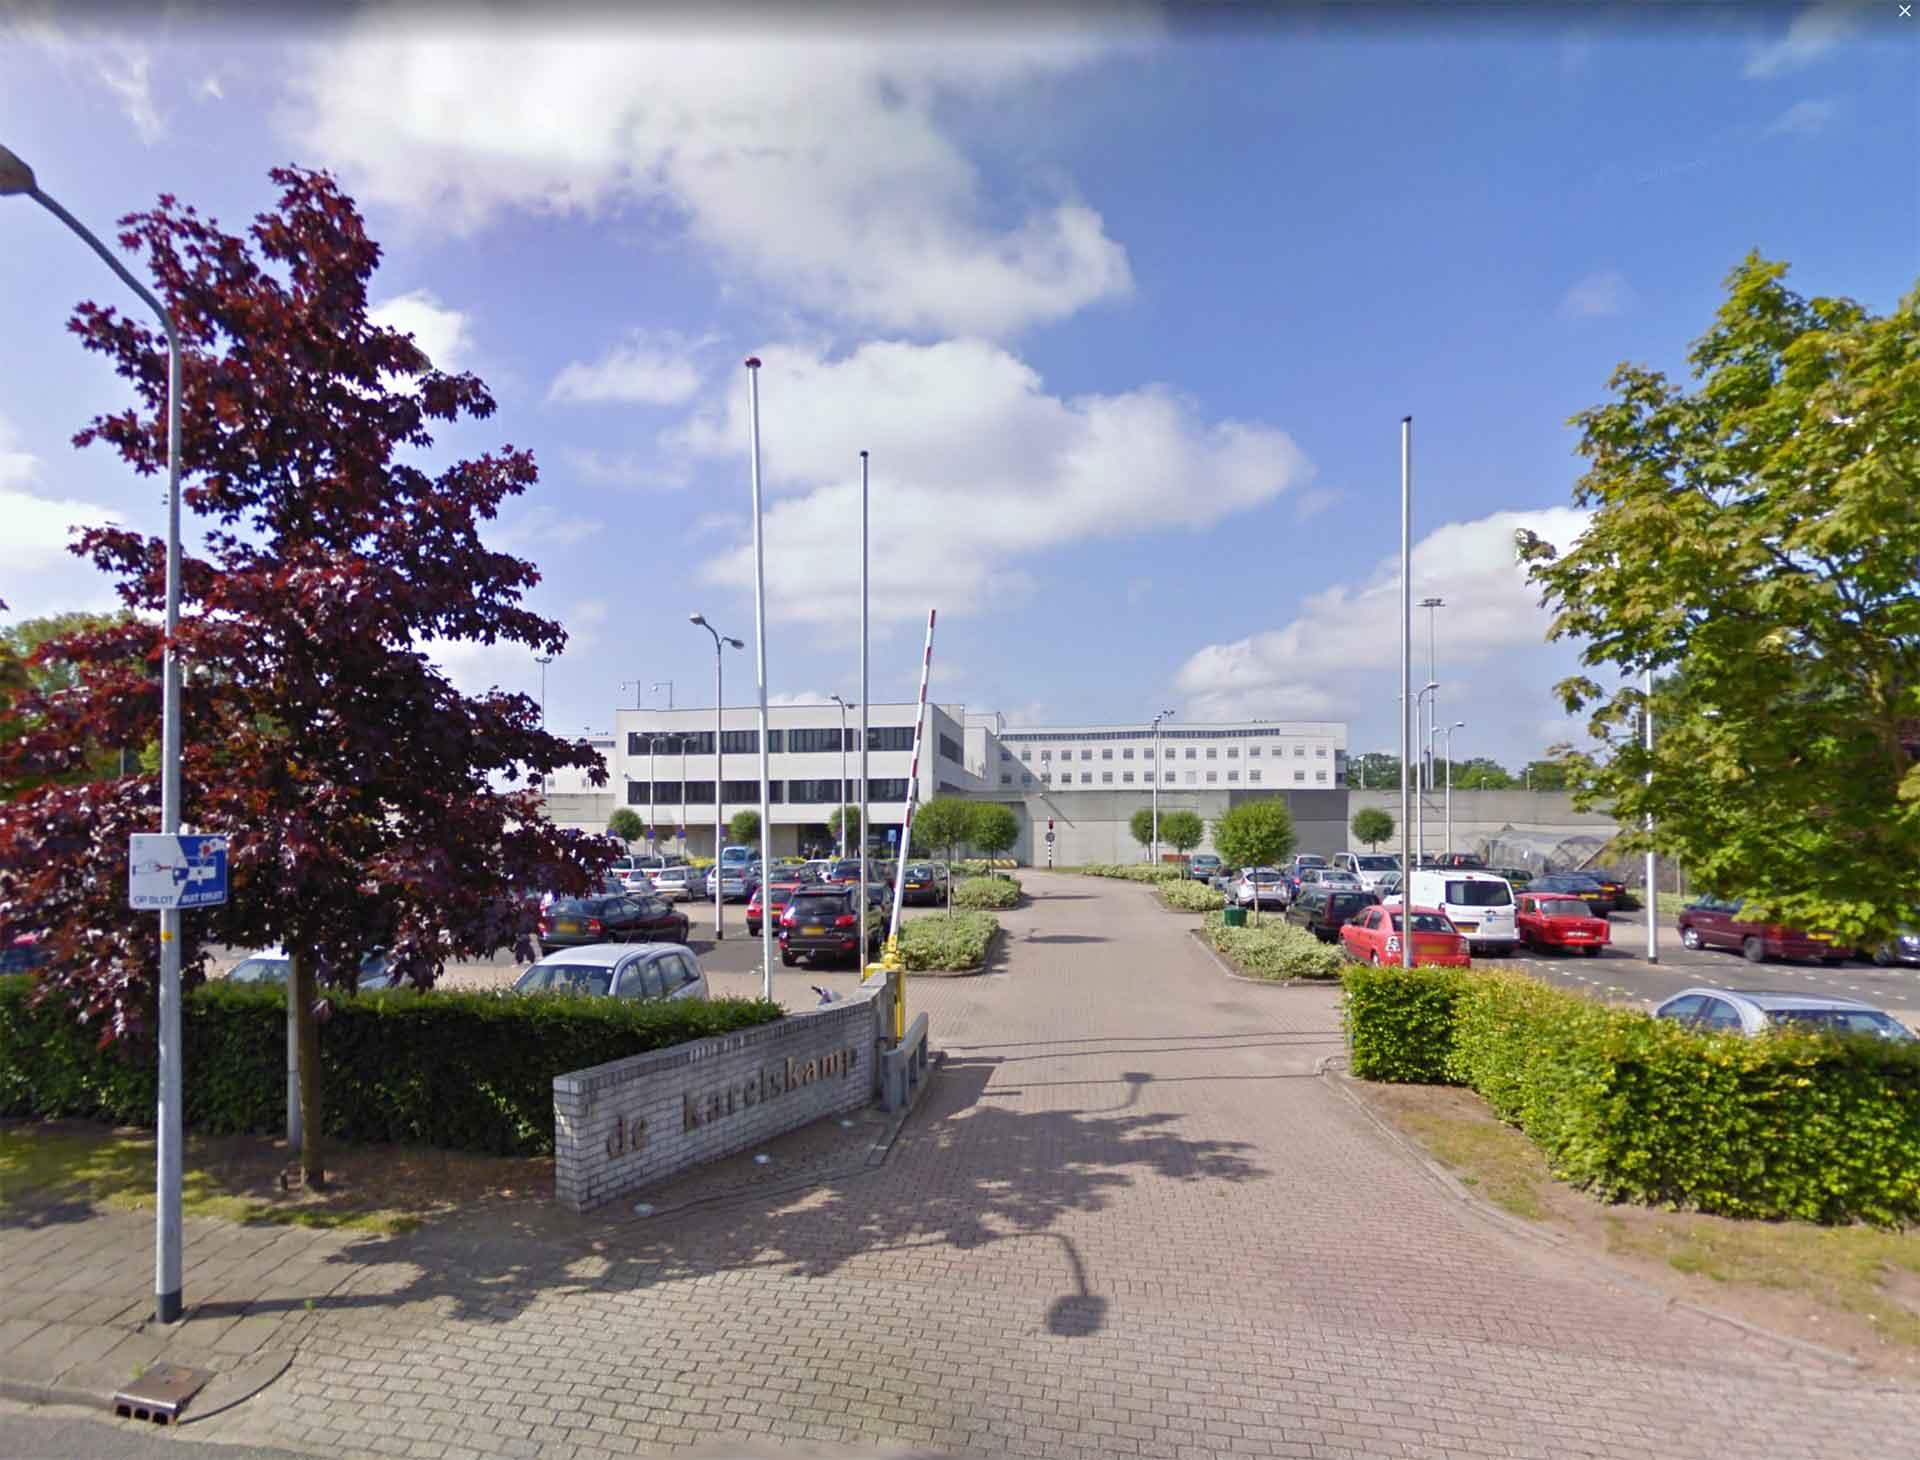 Penitentiaire Inrichting PI Almelo - Weening Strafrechtadvocaten